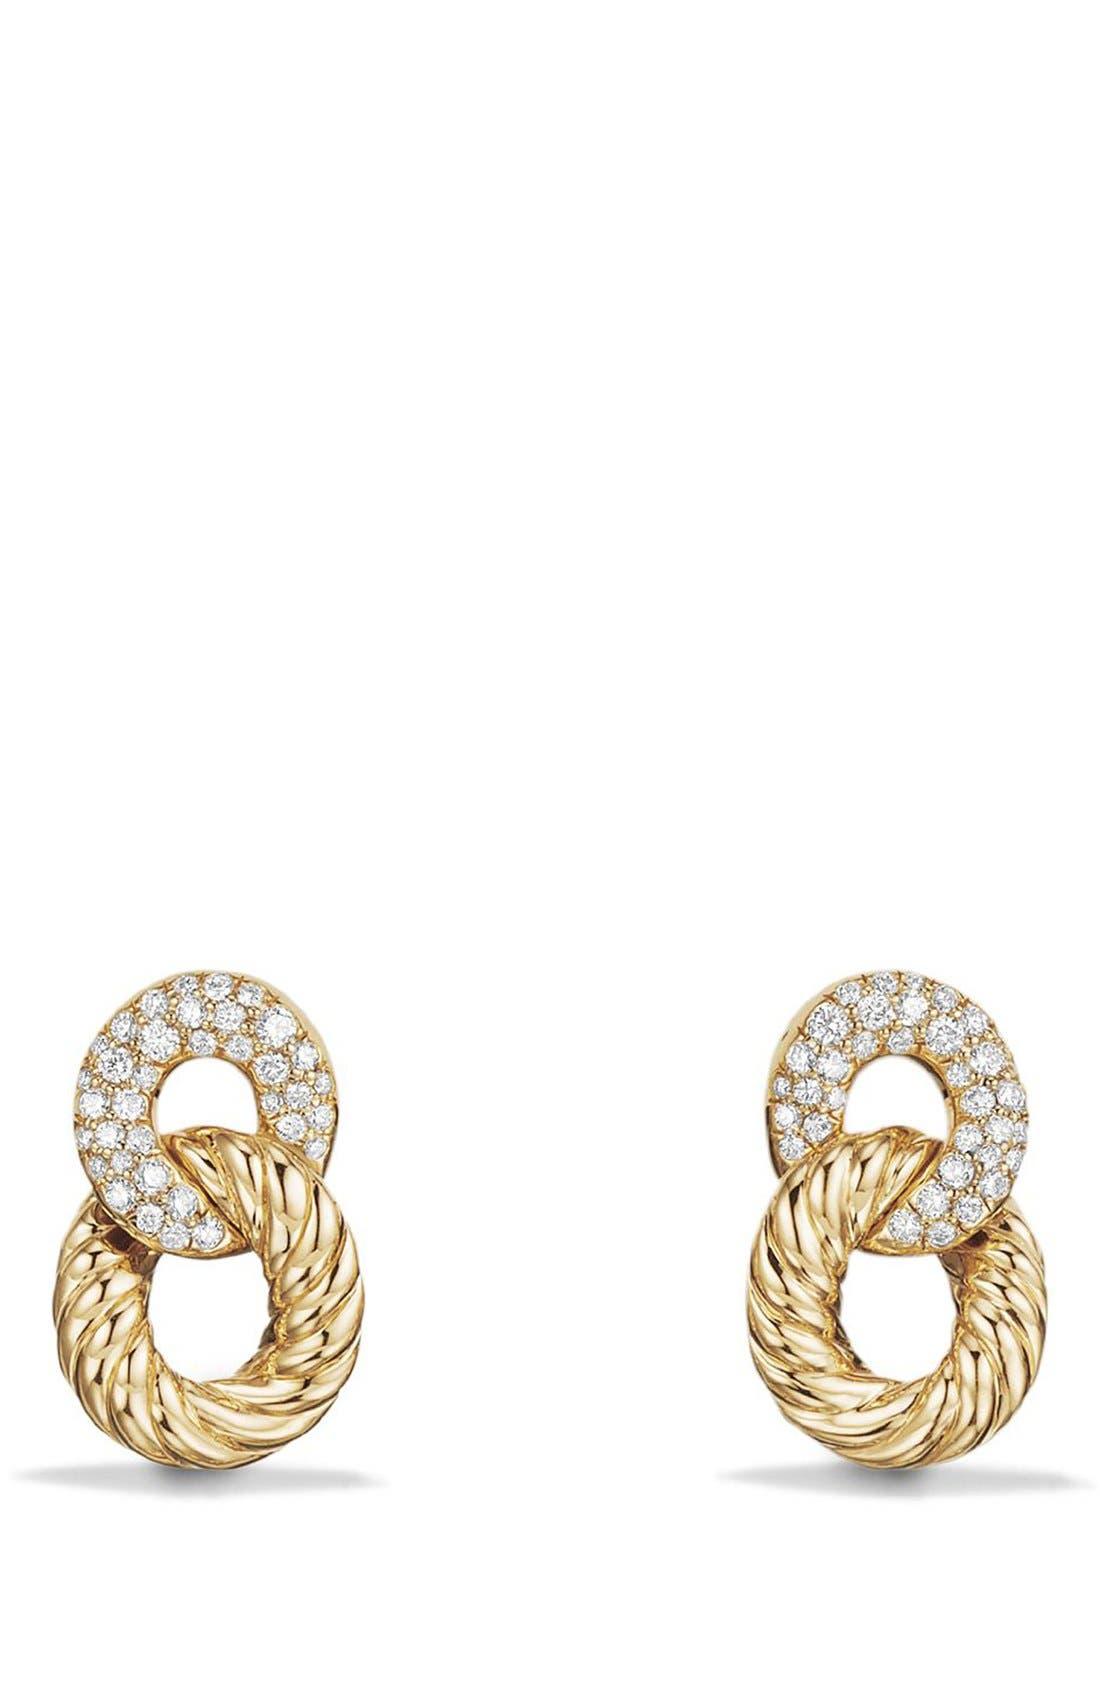 DAVID YURMAN Extra-Small Curb Link Drop Earrings with Diamond in 18K Gold, Main, color, YELLOW GOLD/ DIAMOND